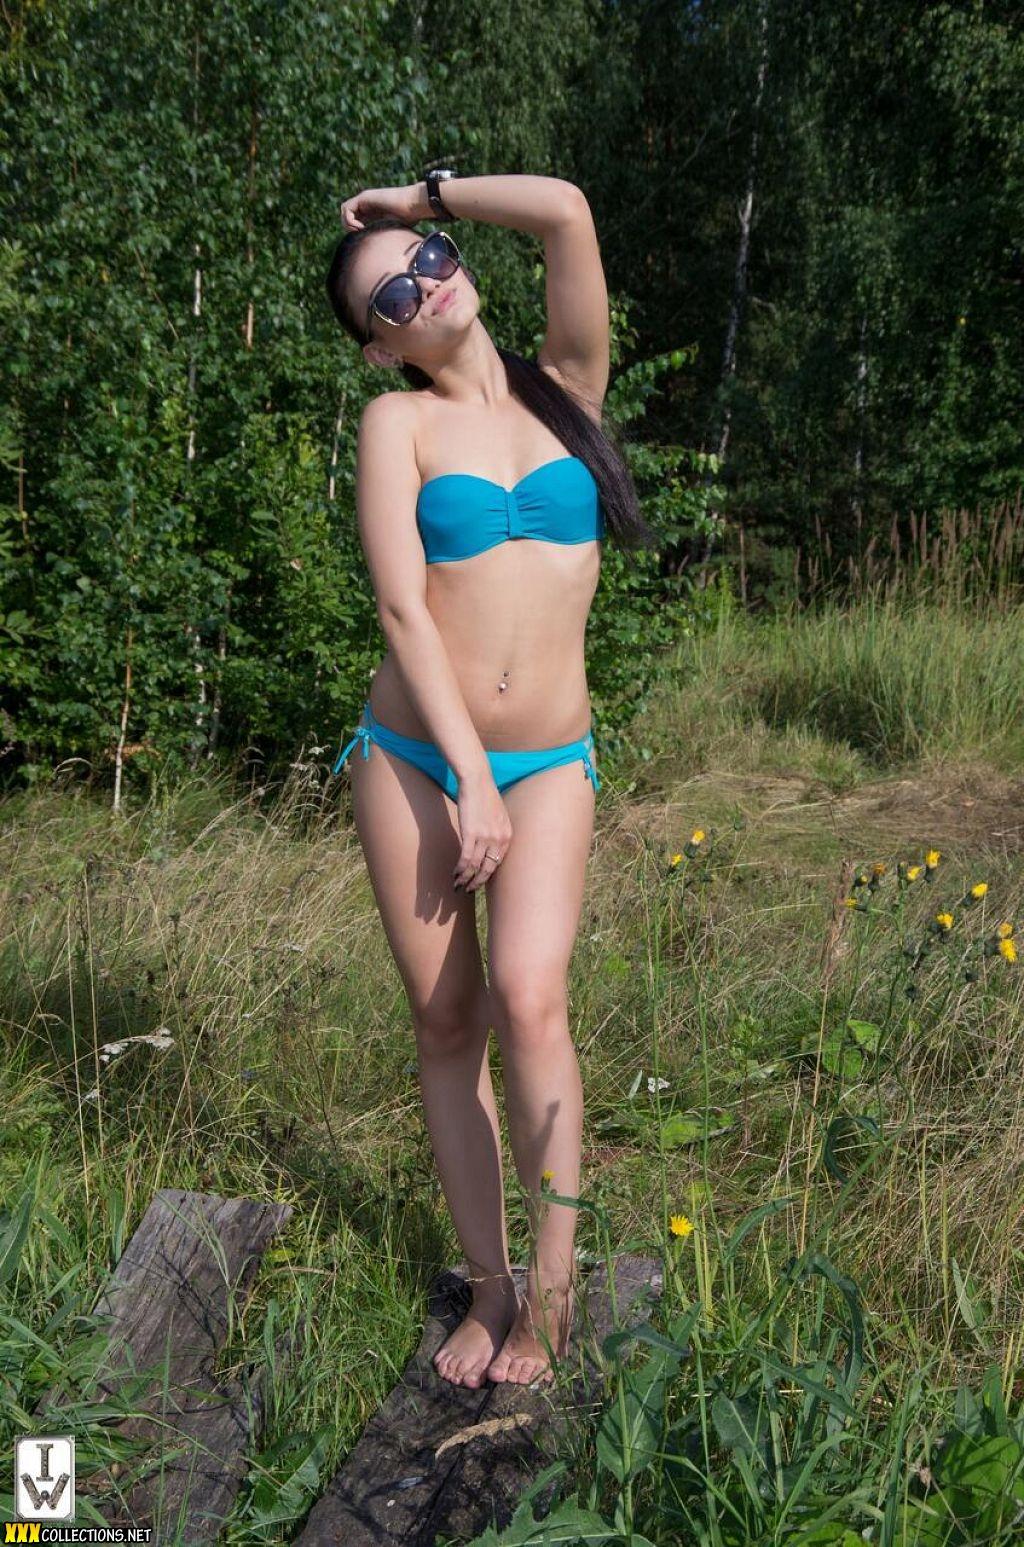 VIDEO! Bikini pic links Babe....In